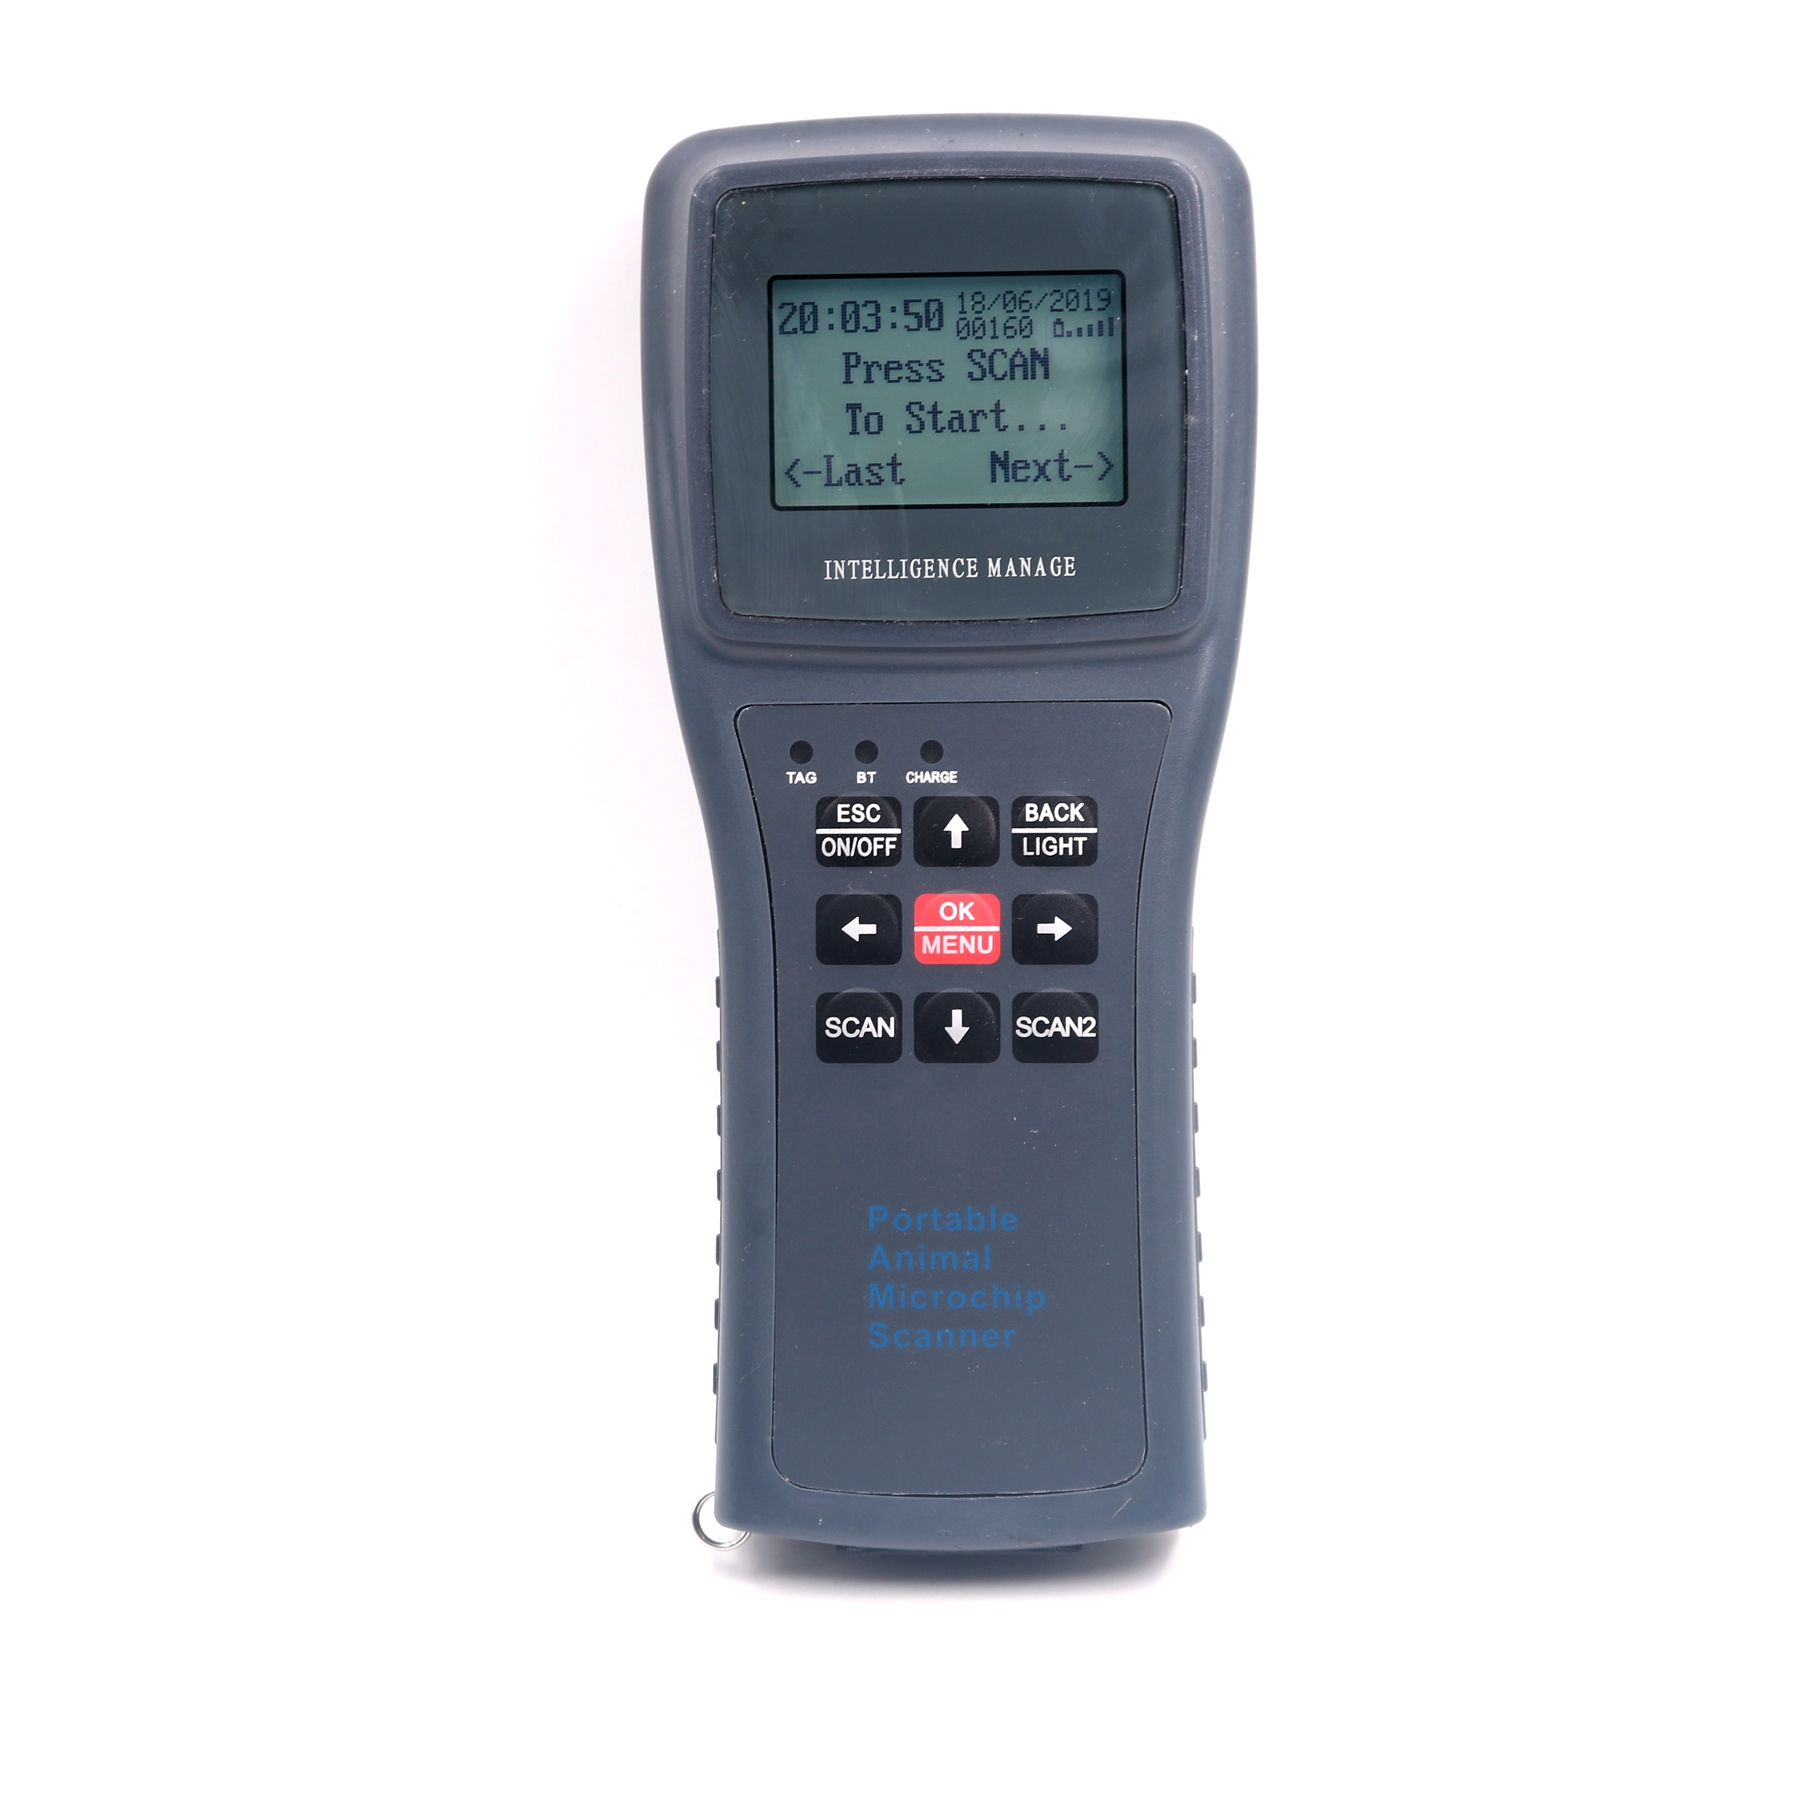 134.2KHz Long Distance Large Memory Portable Animal Microchip Scanner Animal Ear Tag Reader Handheld Reader ISO11785/84 FDX-B